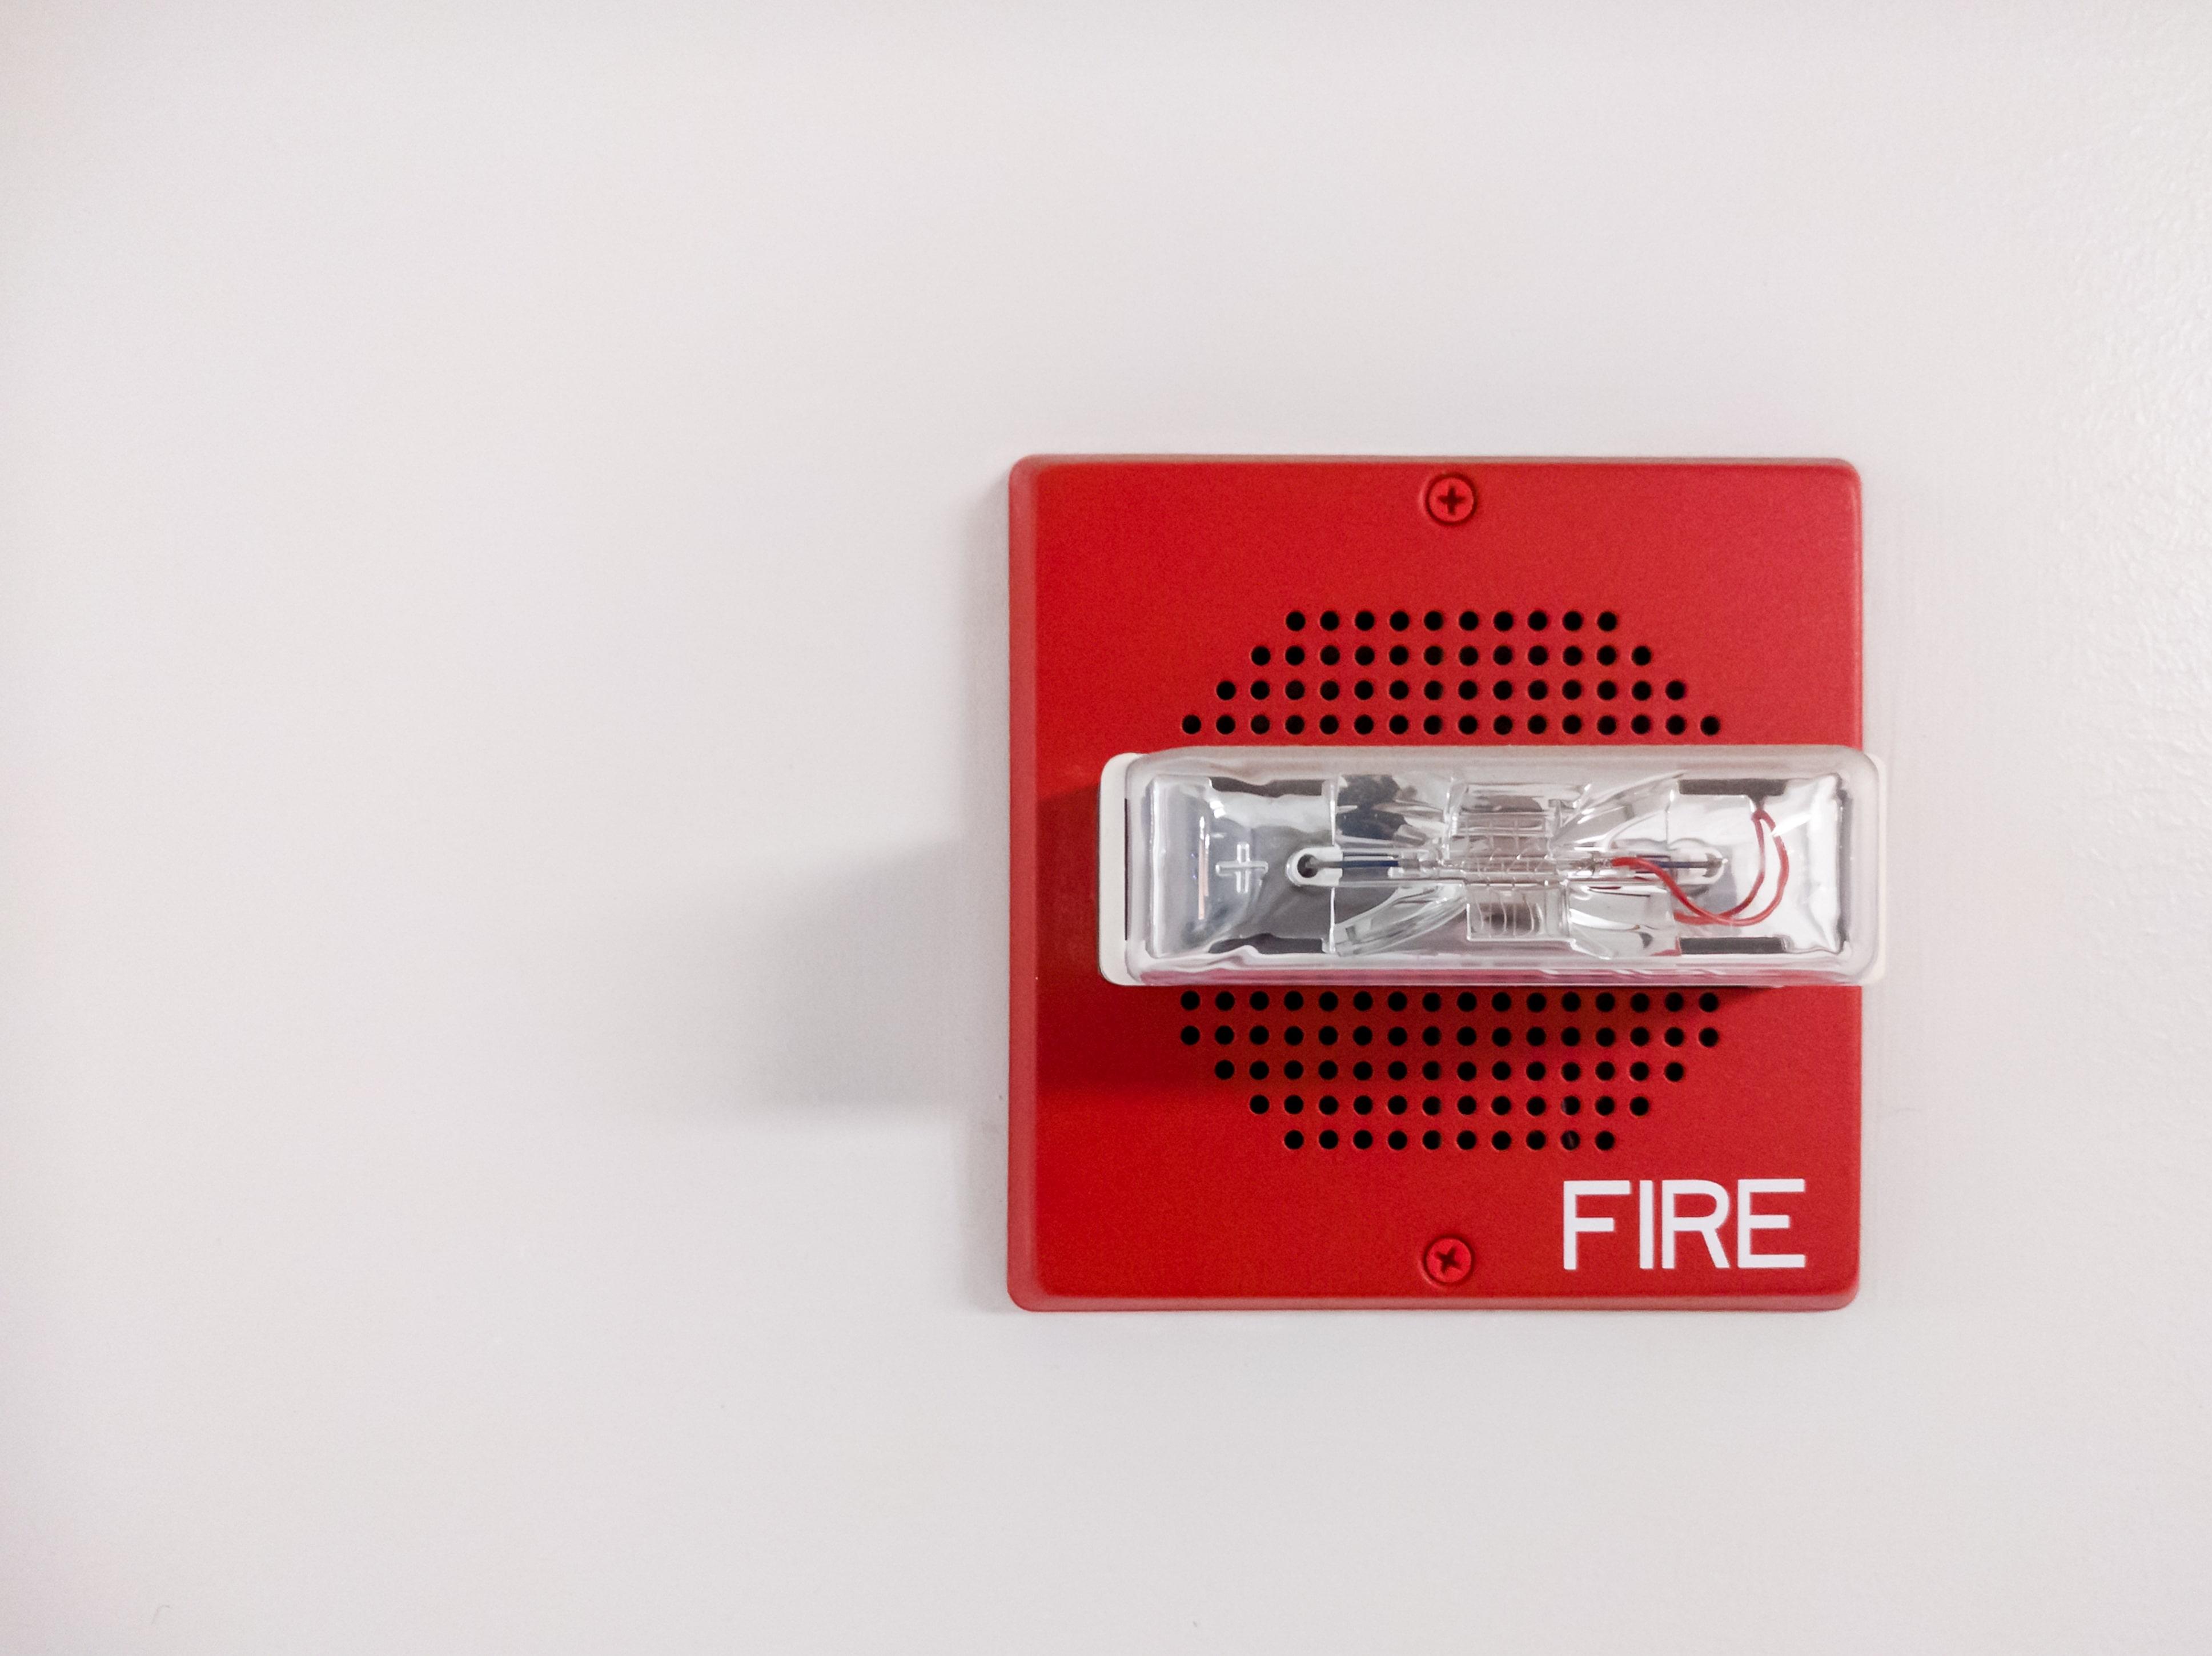 Visual Fire Alarm